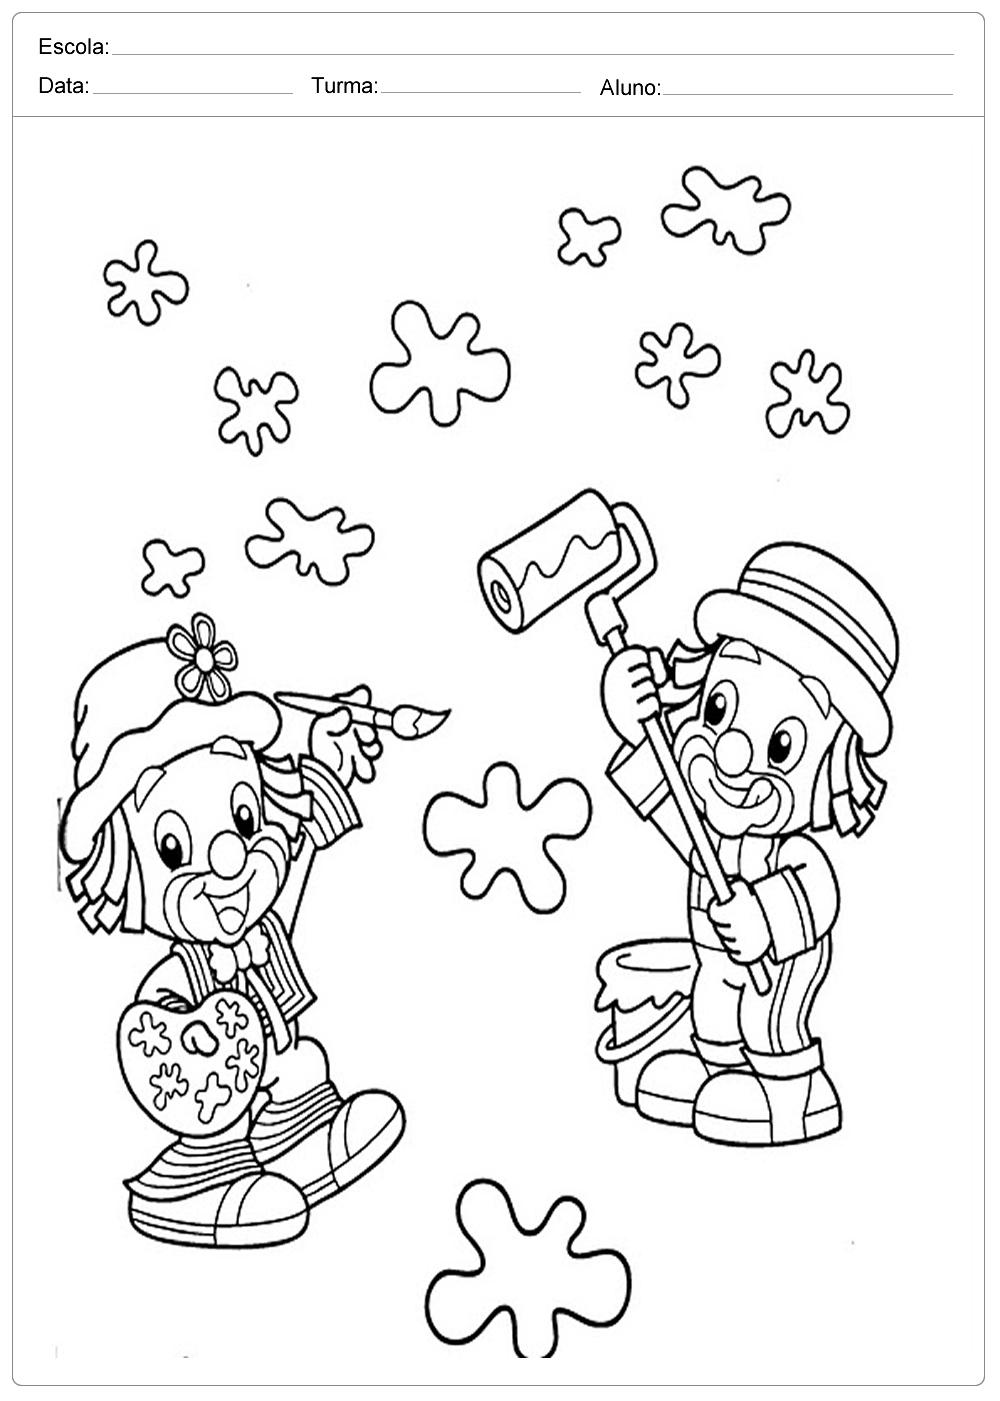 Colorir Patati E Patata Dia Das Criancas Escola Educacao